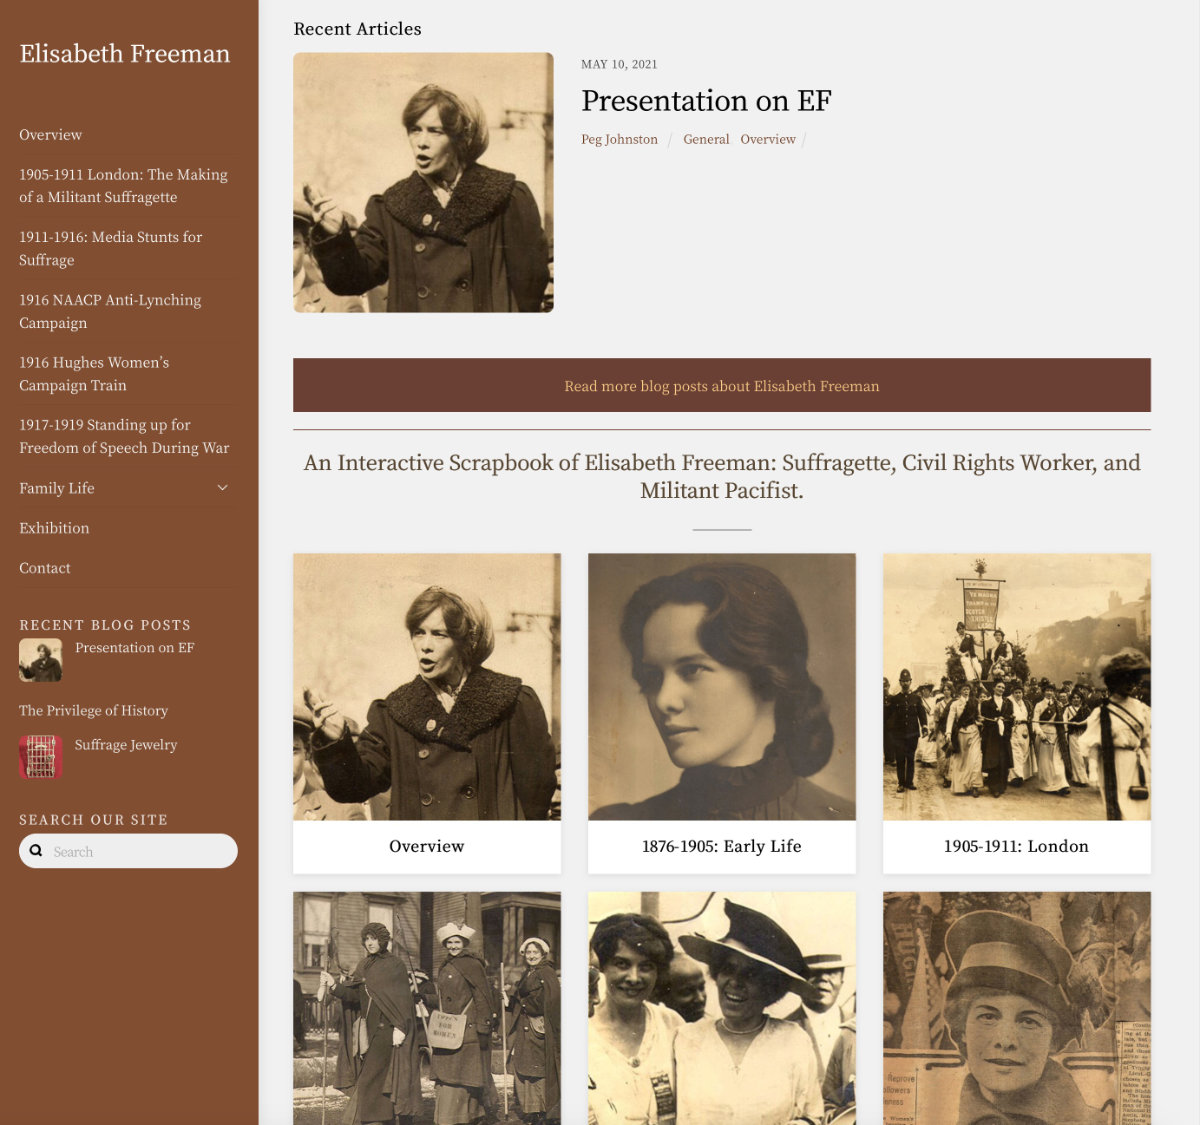 A website highlighting the activities of Elisabeth Freeman: Suffragette, Civil Rights Worker, and Militant Pacifist.  Visit website elisabethfreeman.org